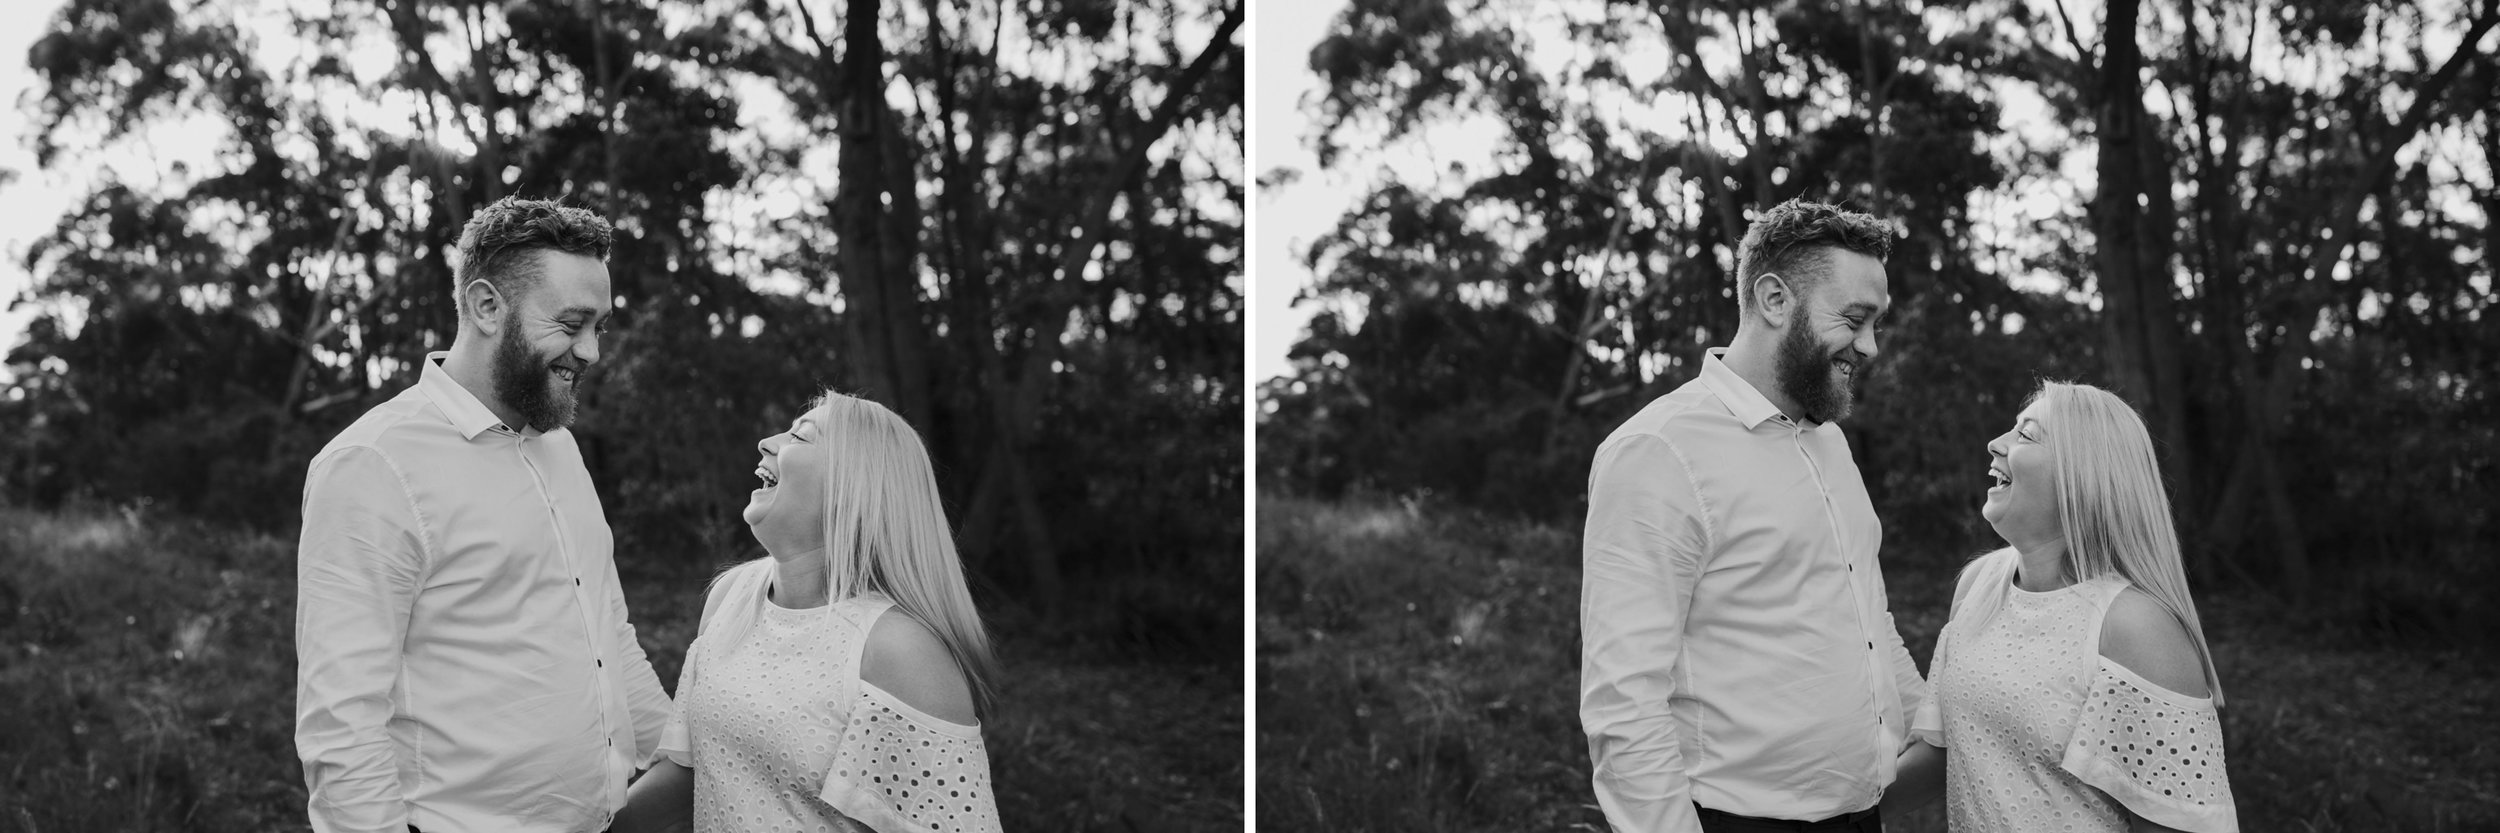 J&L_ElizaJadePhotography-5.jpg